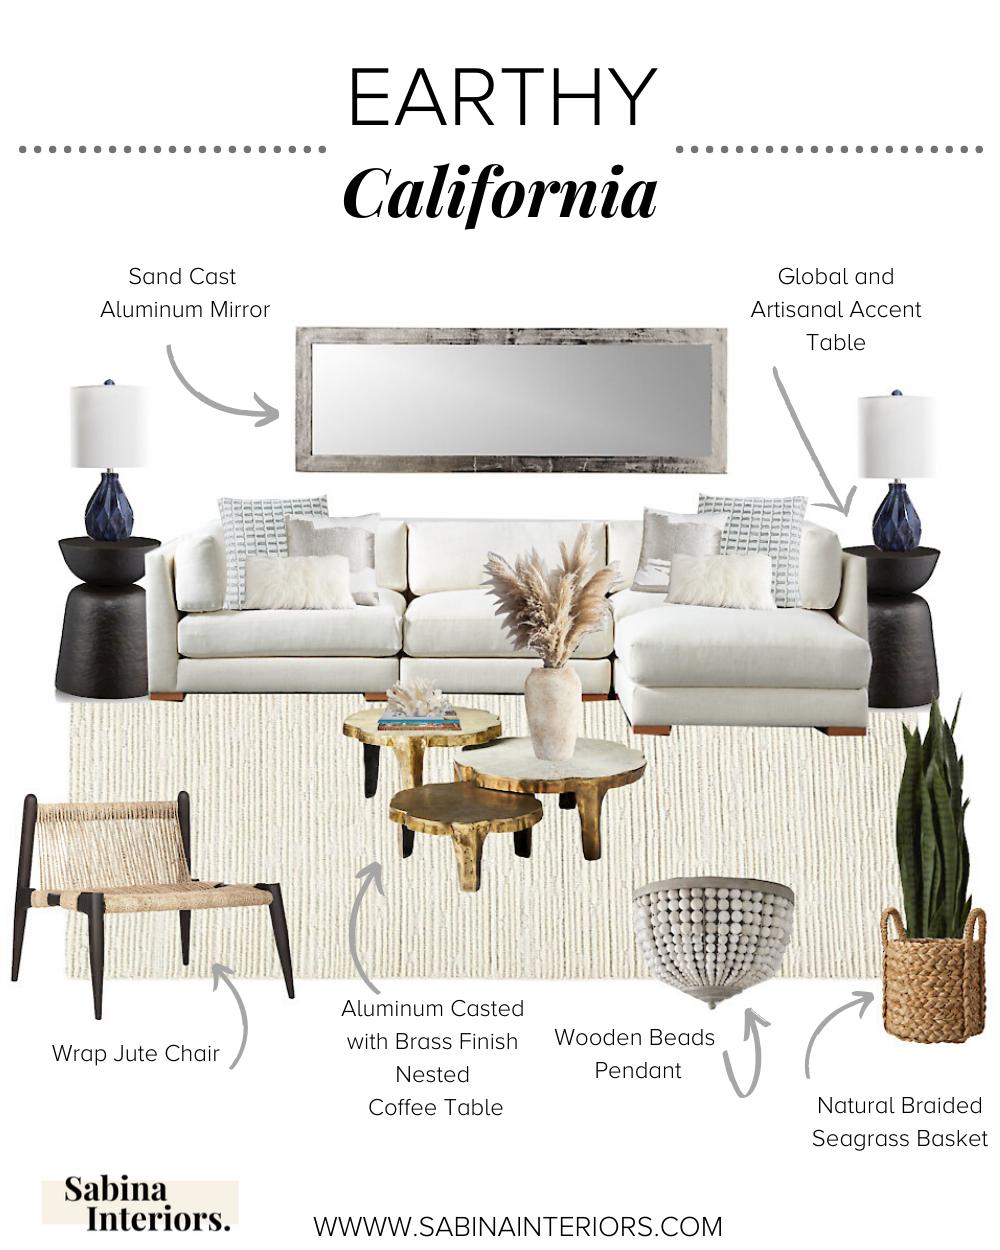 Affordable Online Interior Design Services In 2020 Online Interior Design Casual Living Rooms Online Interior Design Services